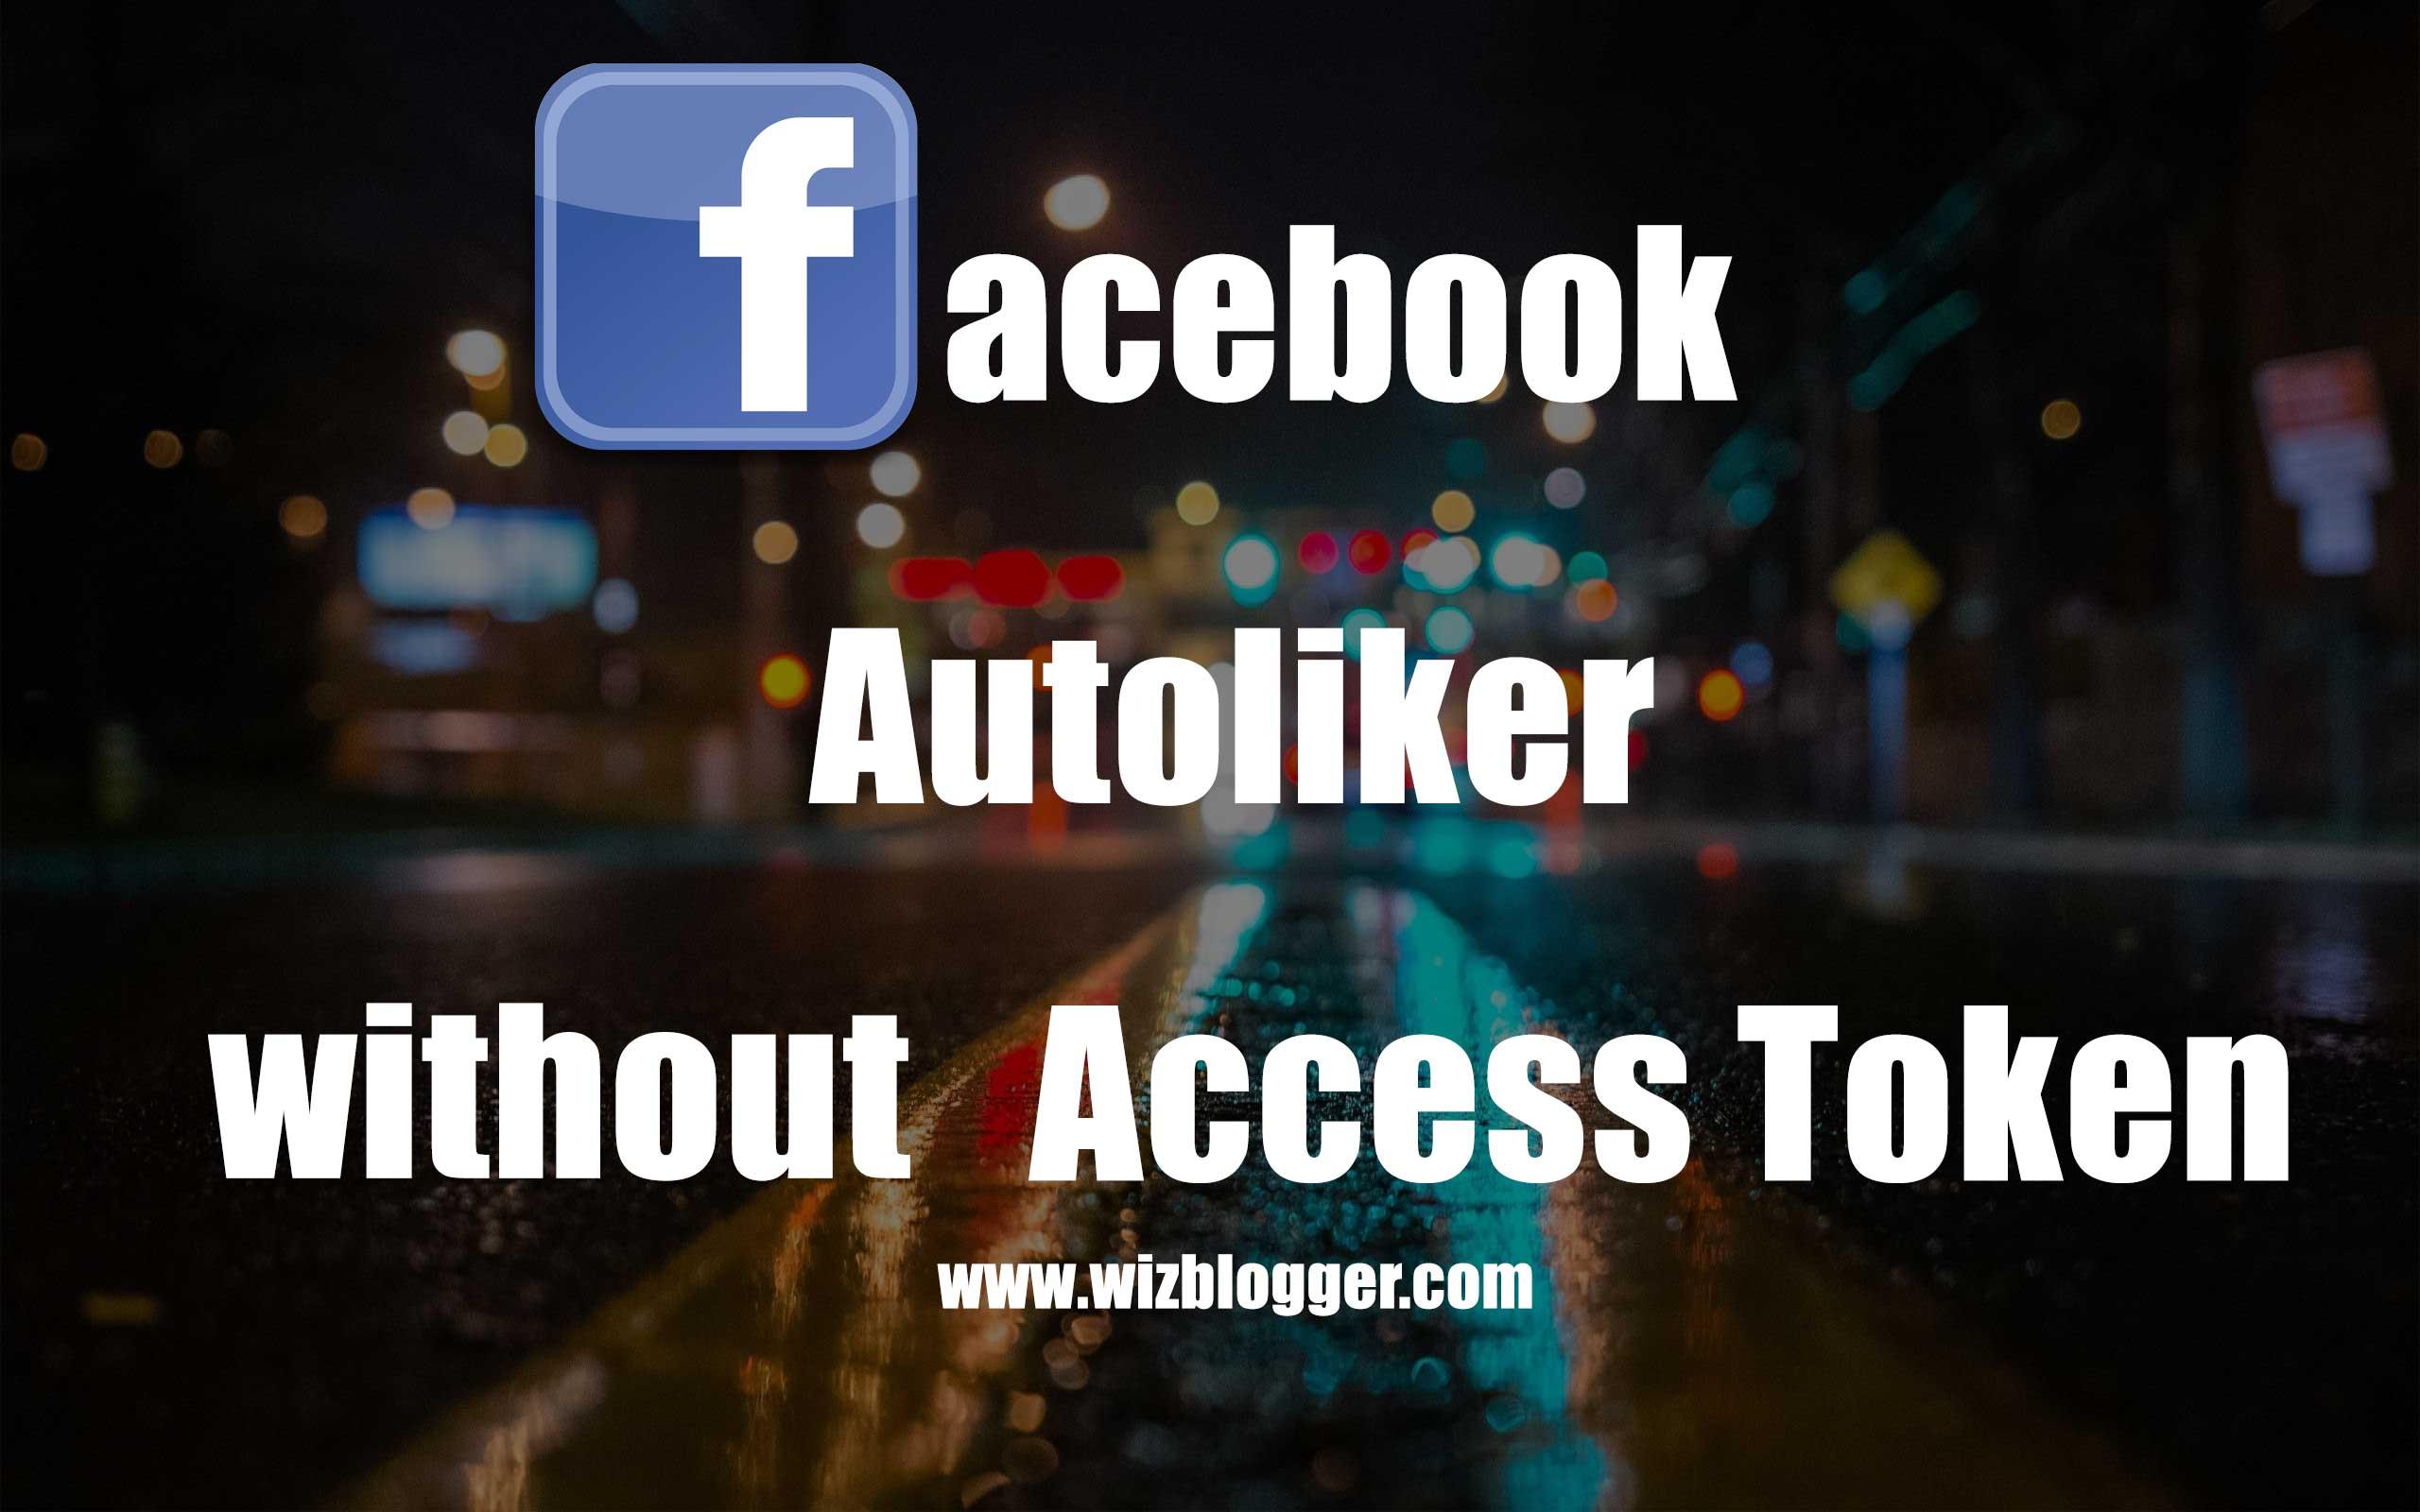 Facebook Auto liker No Access Token No login - Wizblogger